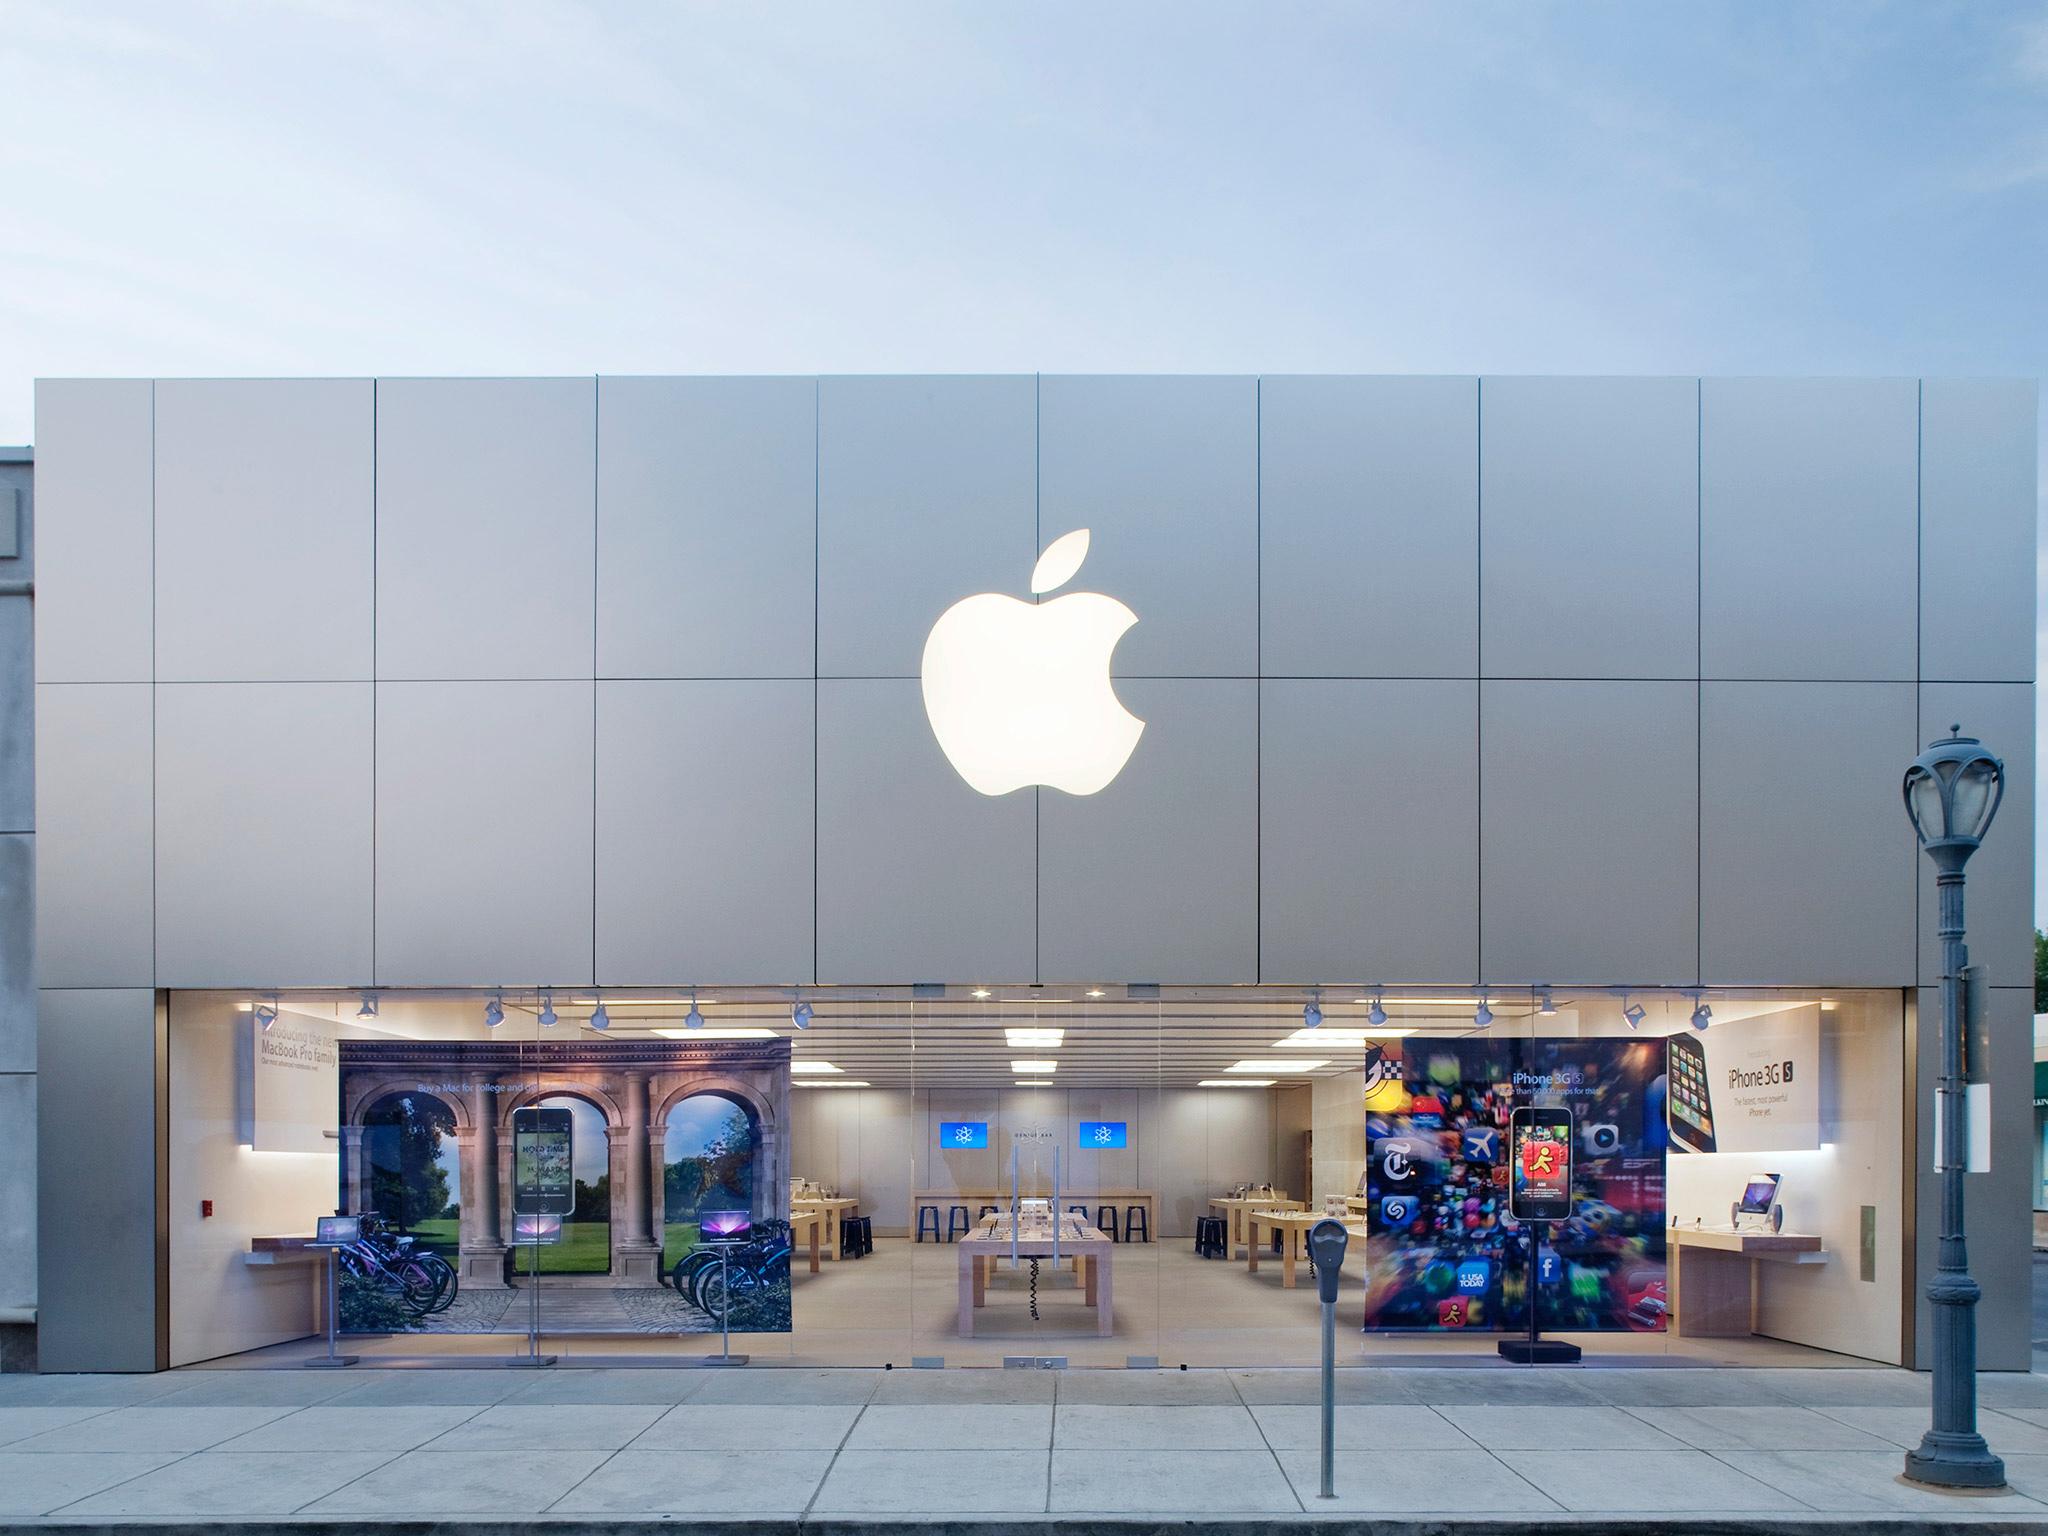 apple suburban square   ardmore pennsylvania insider pages